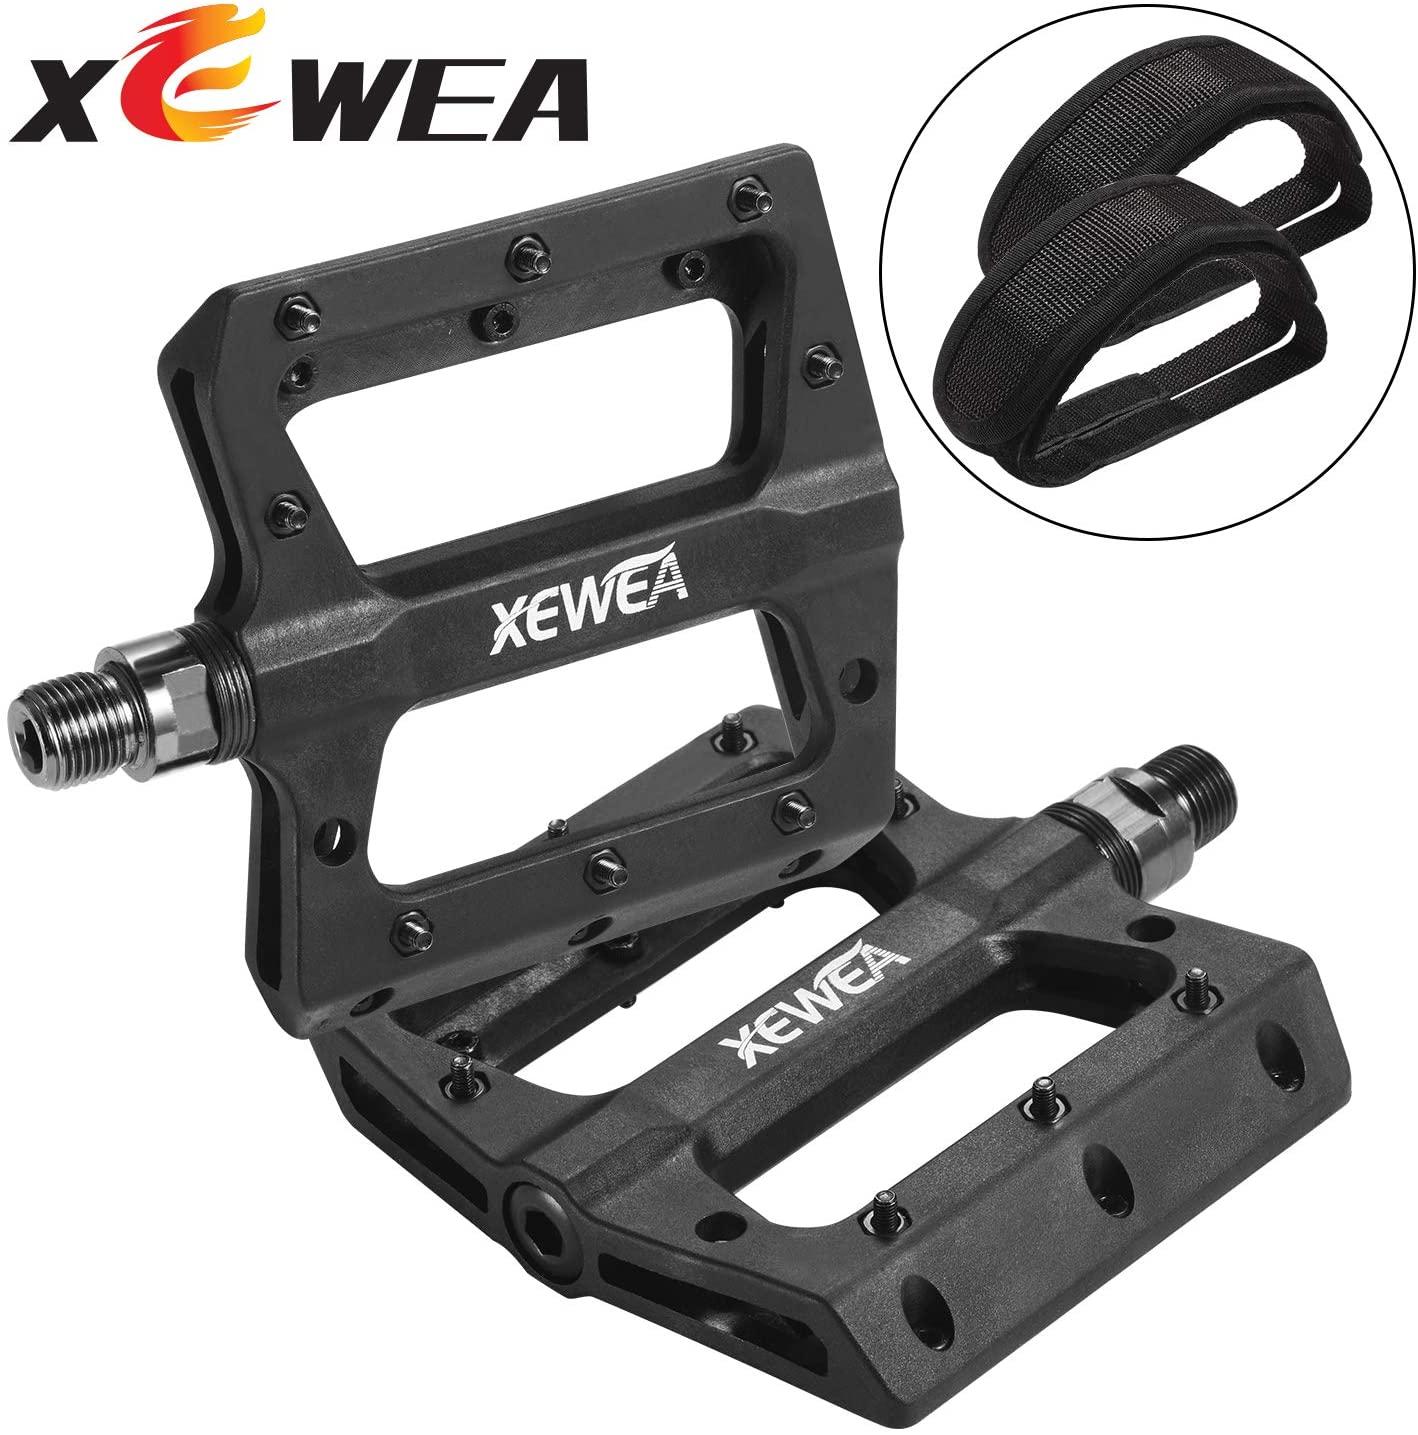 XEWEA Bike Pedal Straps Set, Nylon Fabric Anti-Slip Durable Mountain Bike Flat Pedals,Ultralight Big Platform Pedals for Road MTB Peleton BMX Bike Bicycle 9/16